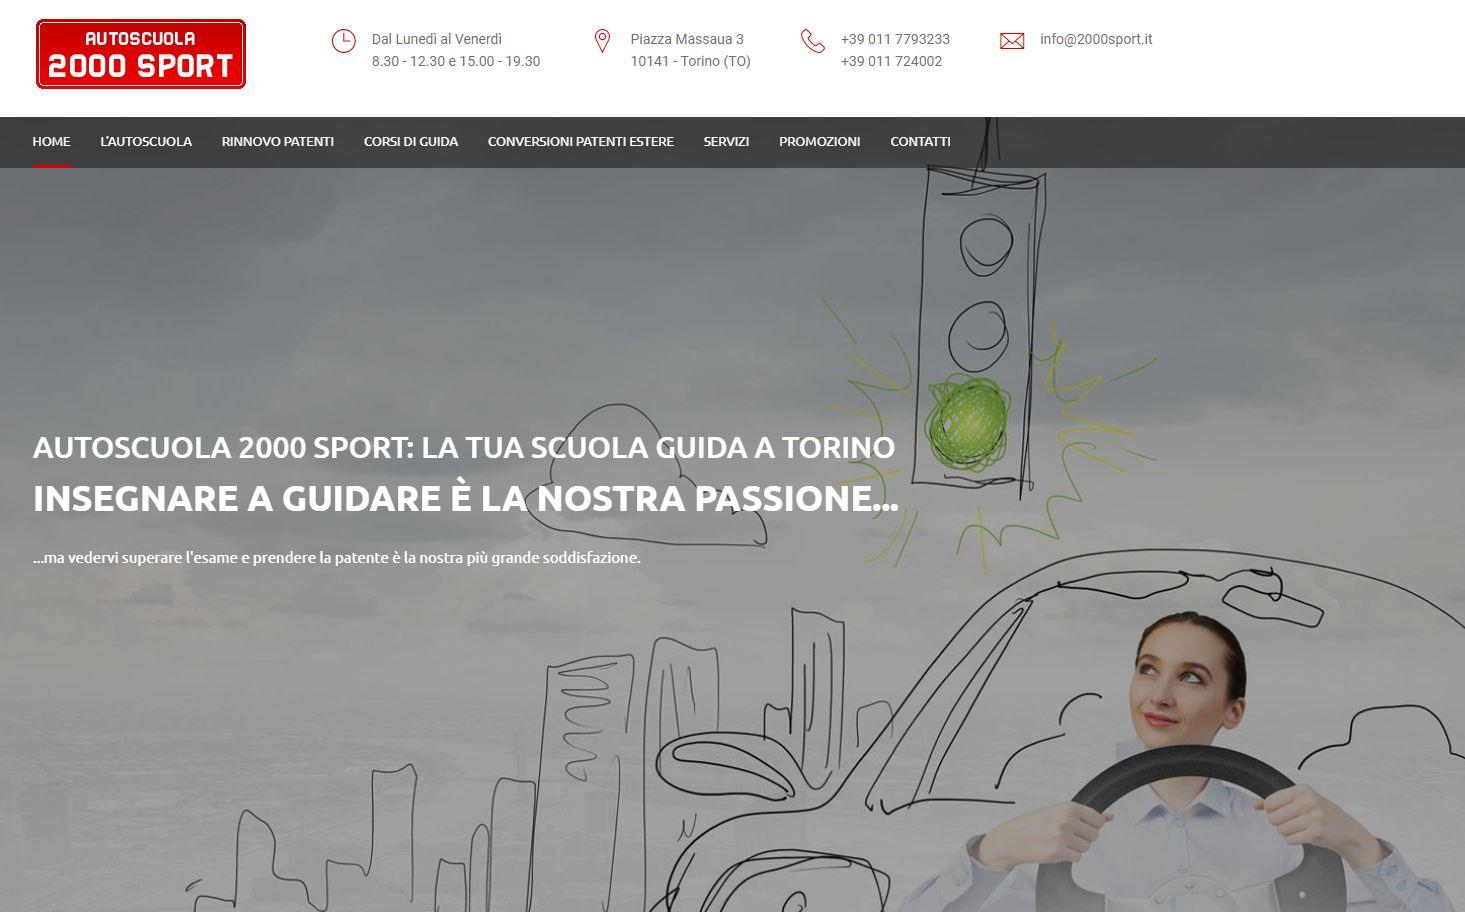 Autoscuola 2000 Sport & Anicecommunication